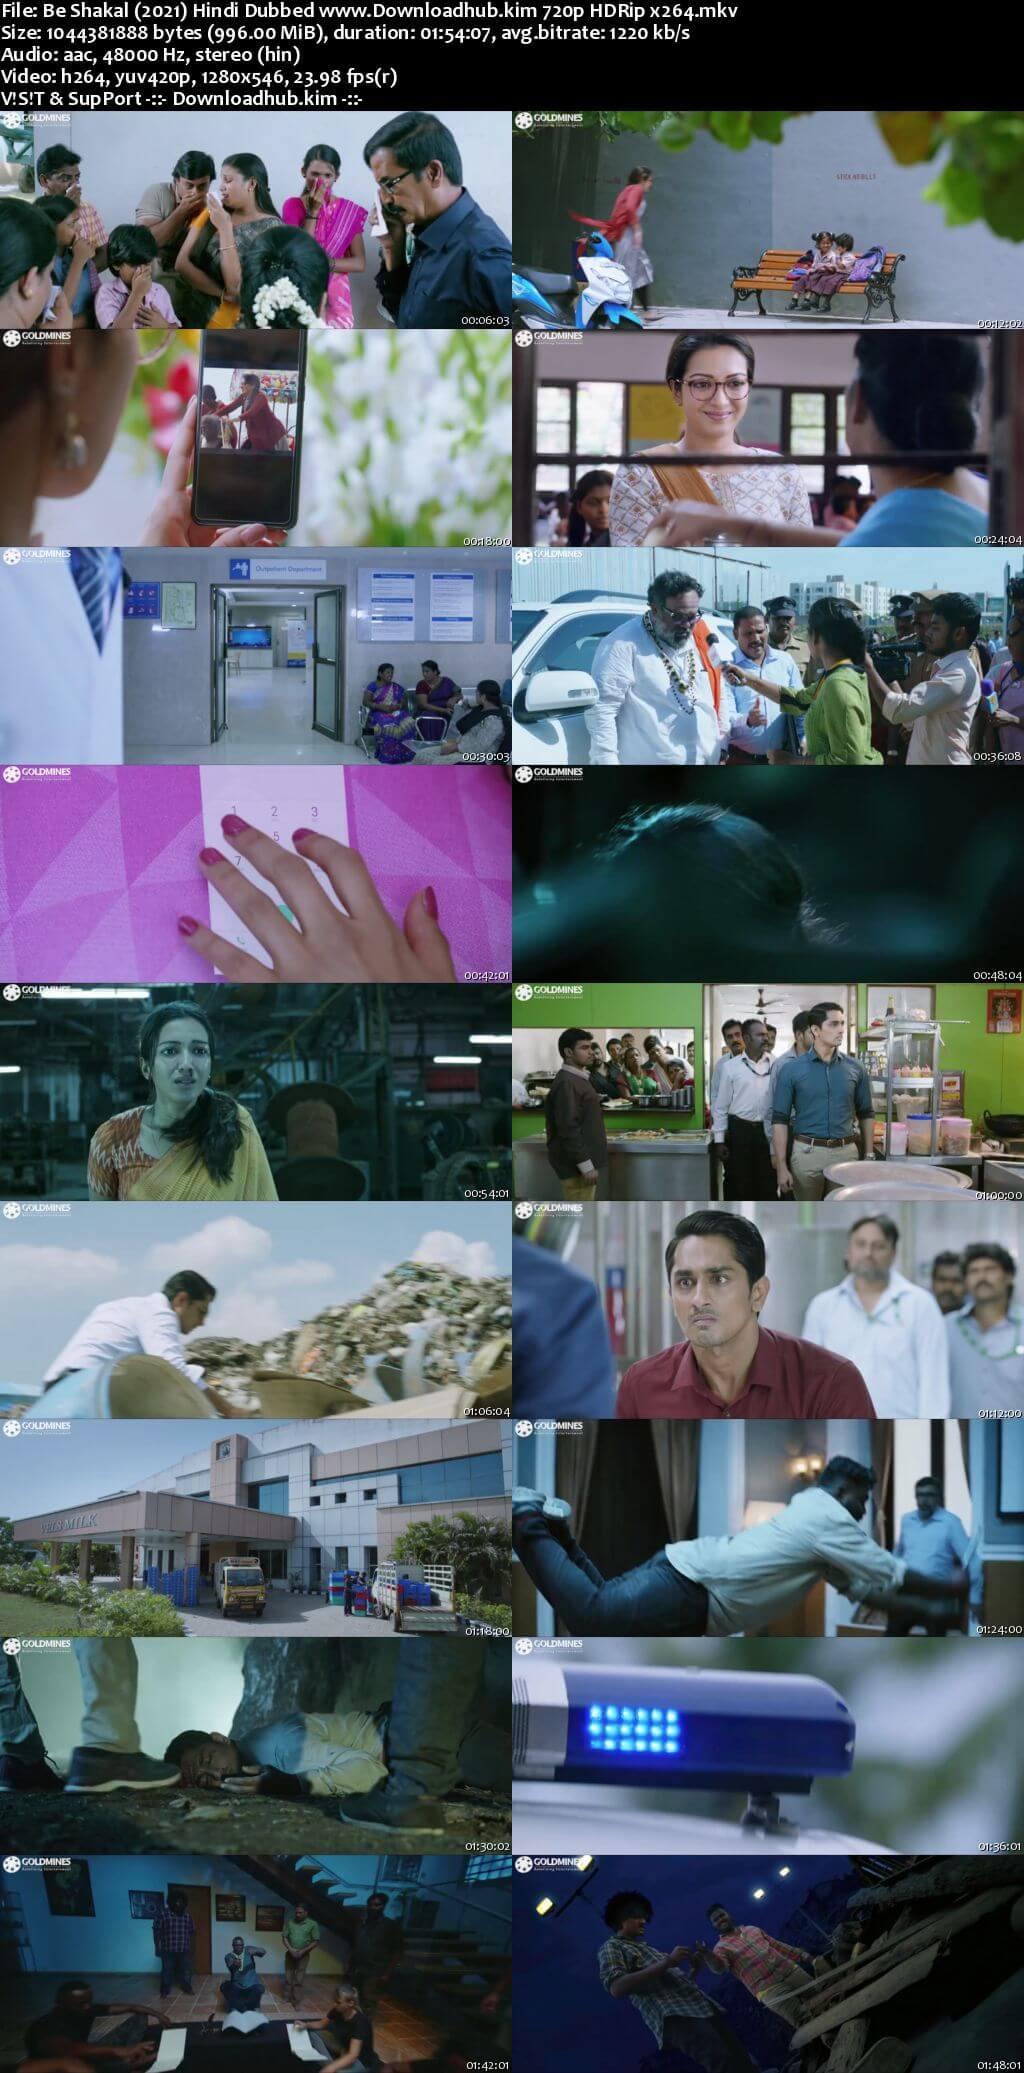 Be Shakal 2021 Hindi Dubbed 720p HDRip x264